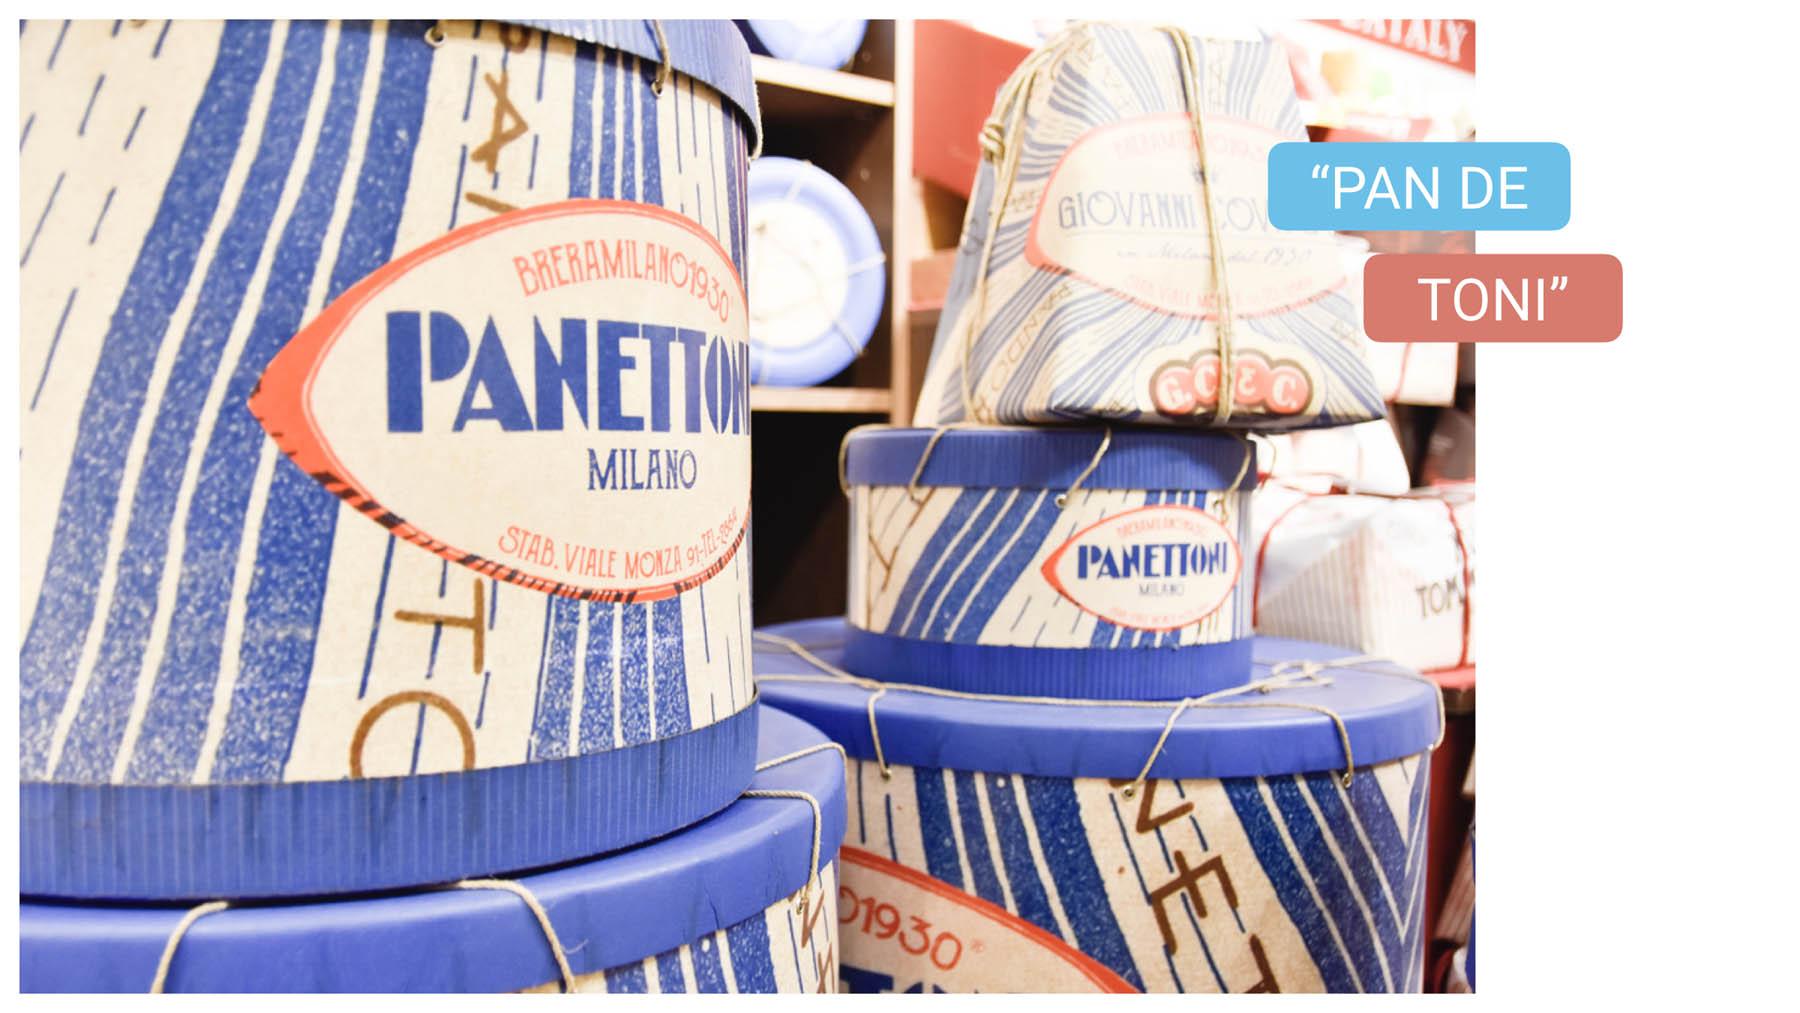 Typical food in Milan - milano bike tour - panettone